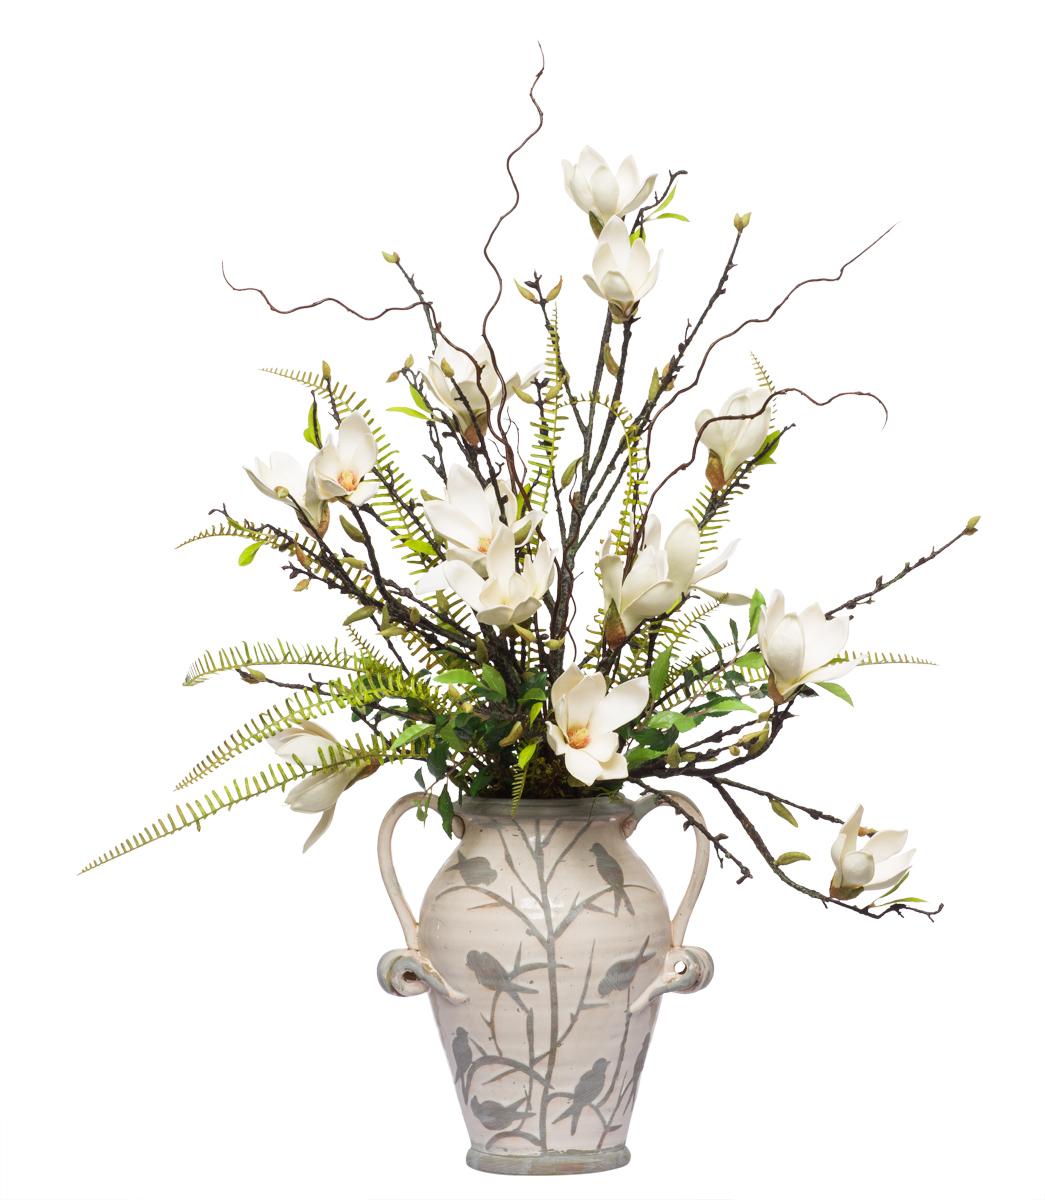 ** Magnolia Fream Spray in Small Bird Vase